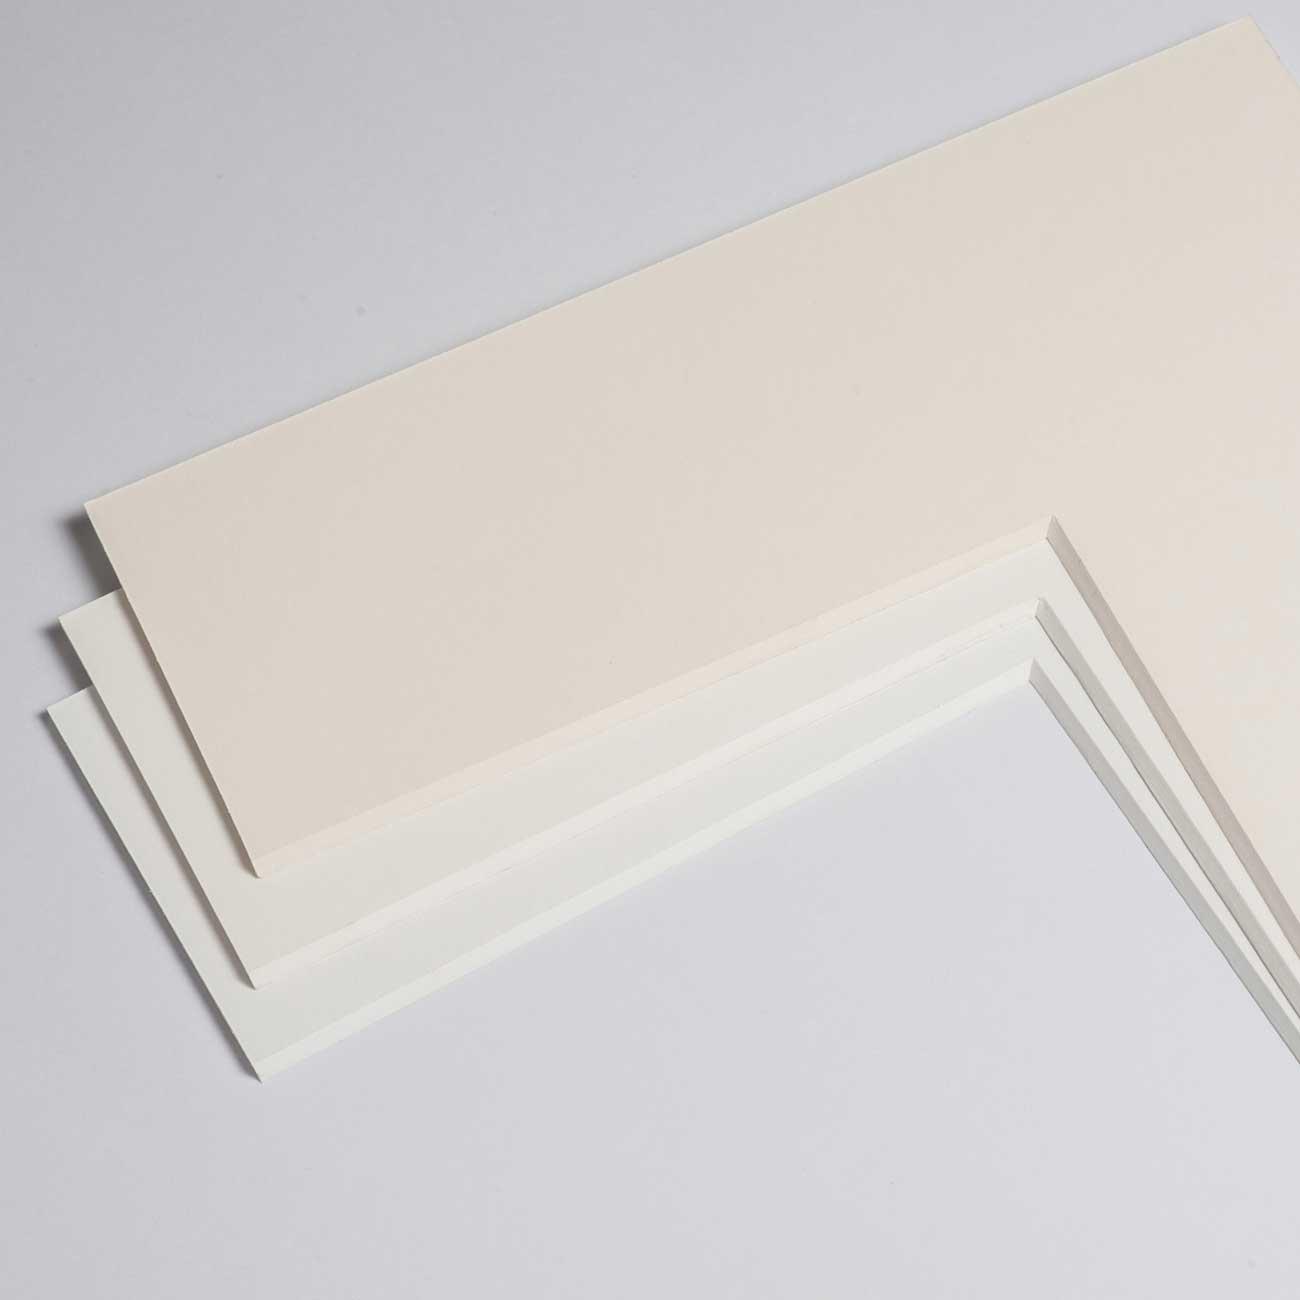 2,3 mm Baumwoll-Passepartout mit individuellem Ausschnitt